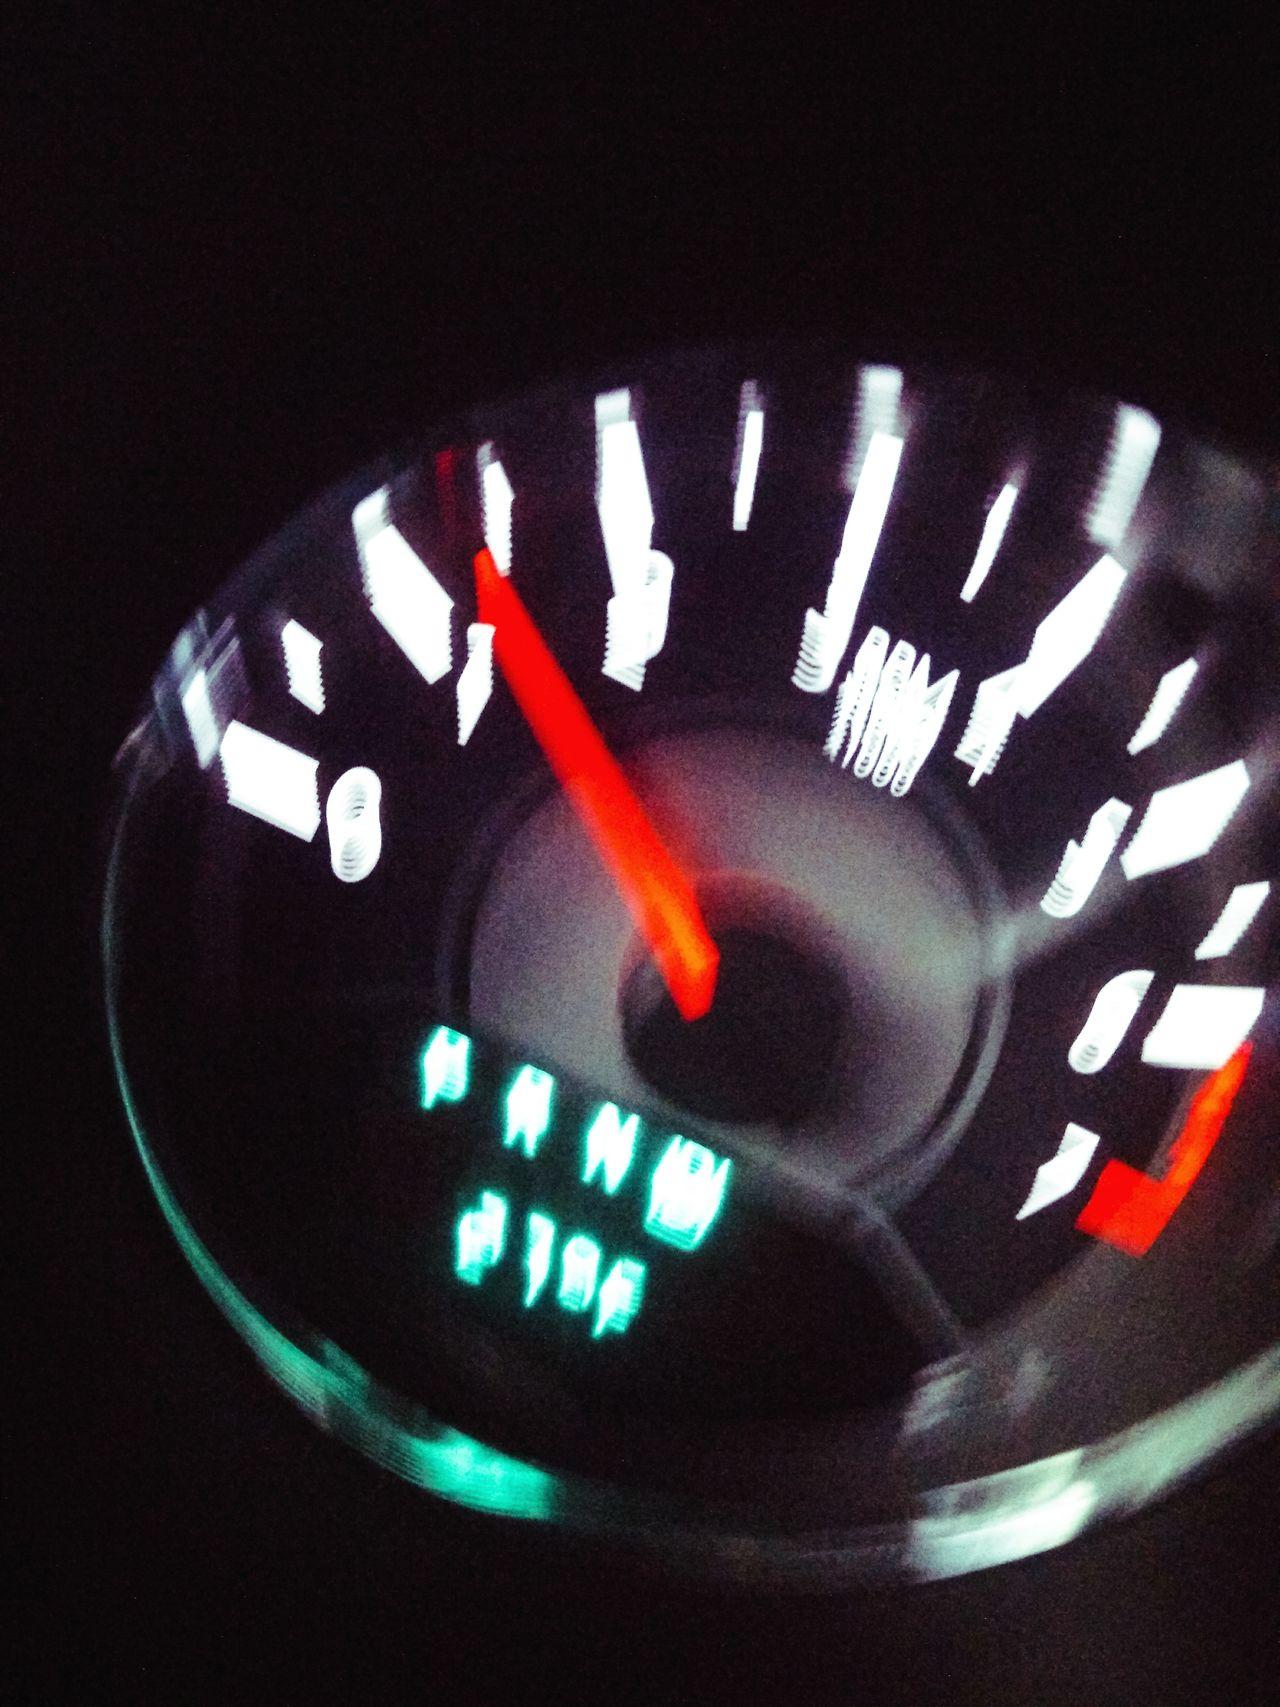 Number Close-up Speedometer Transportation Gauge Illuminated Car Interior Dashboard No People Control Panel Night Glitch